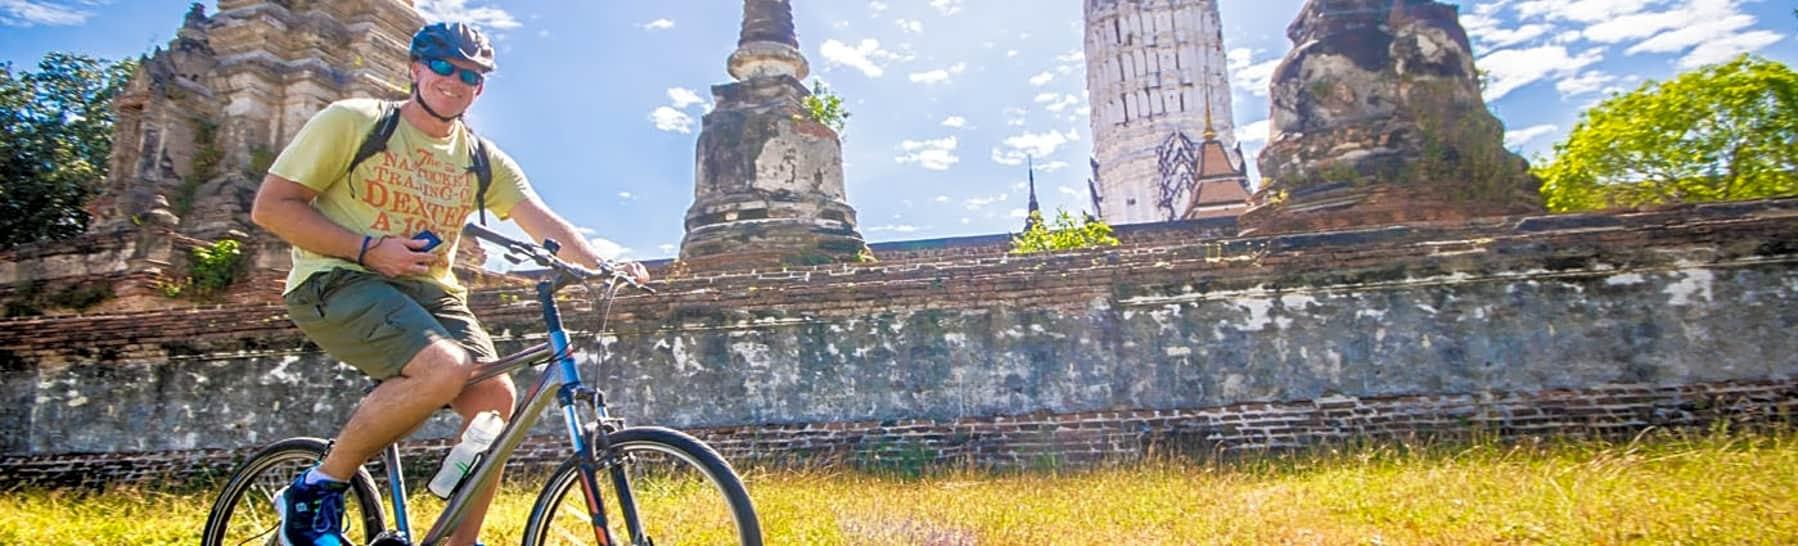 Day Trip Biking Through Historic Ayutthaya gallery